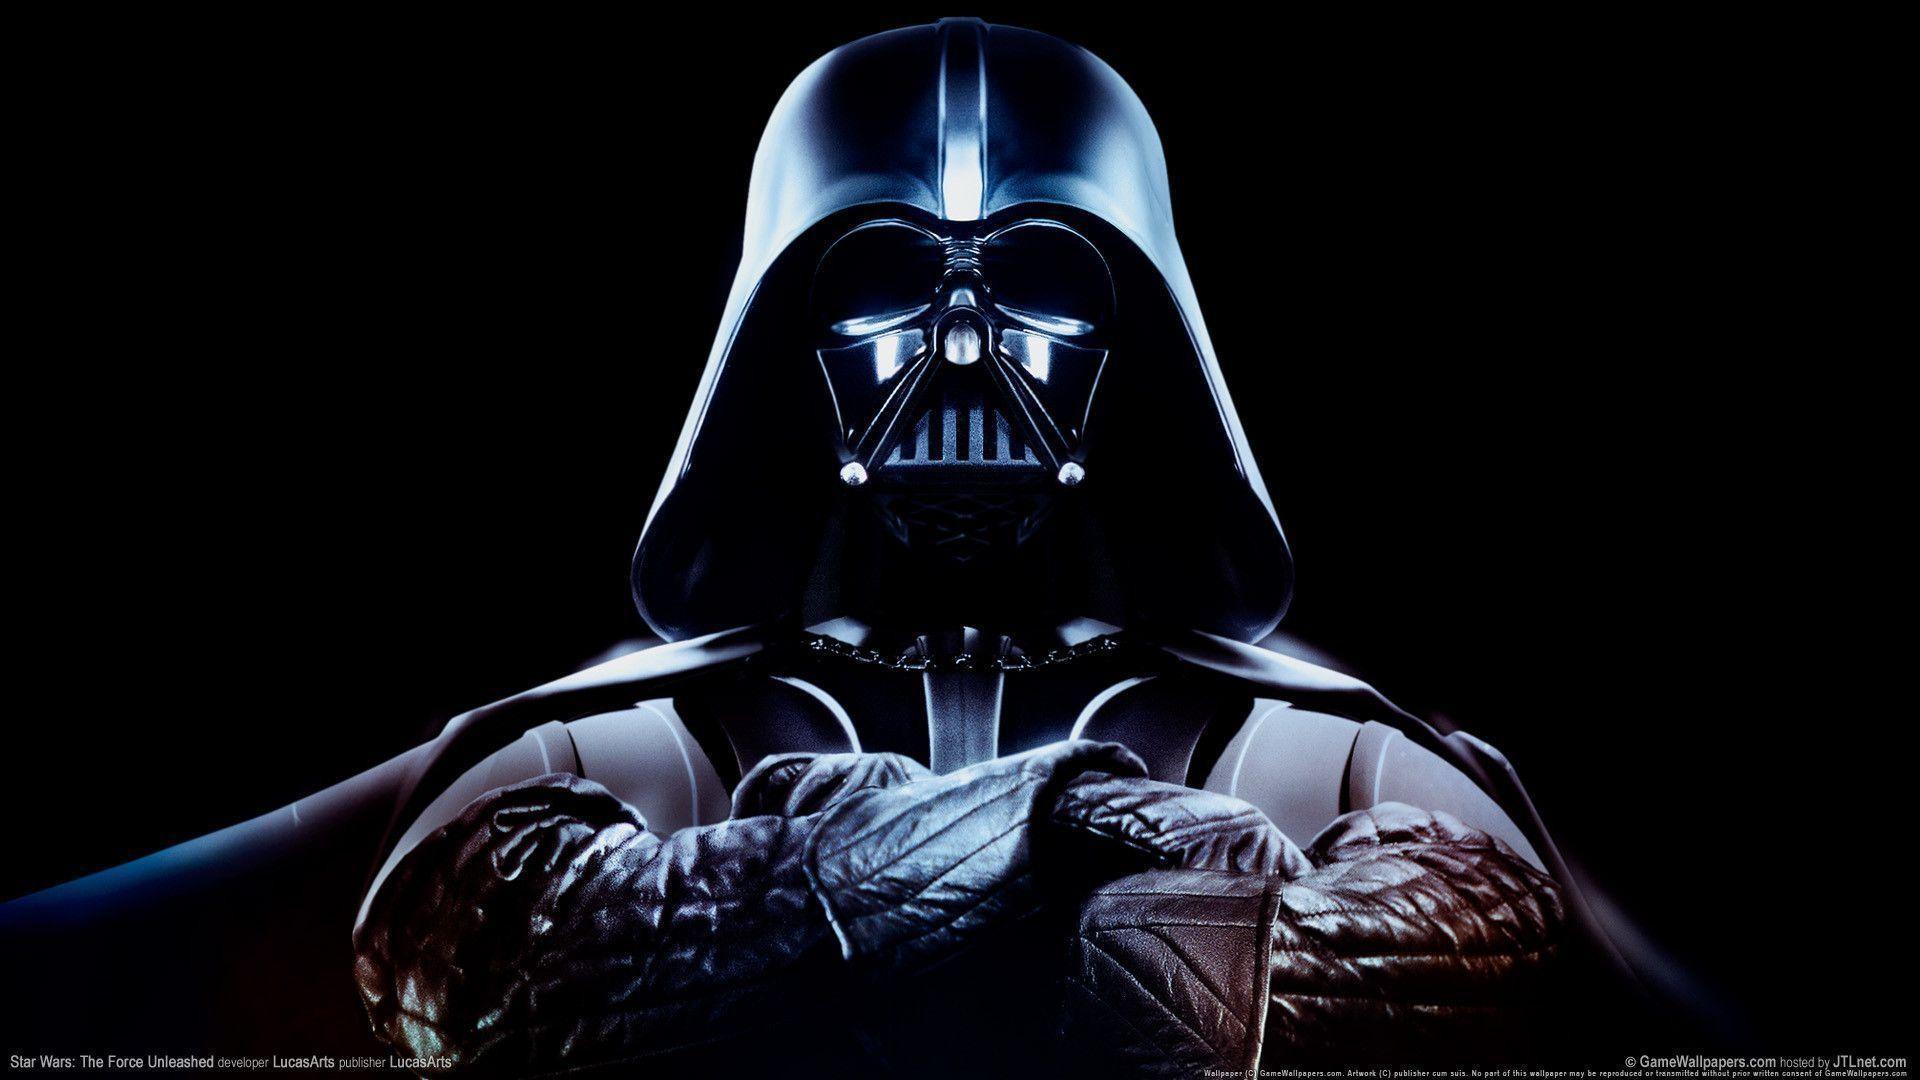 STAR WAR WALLPAPER: Star Wars Picture